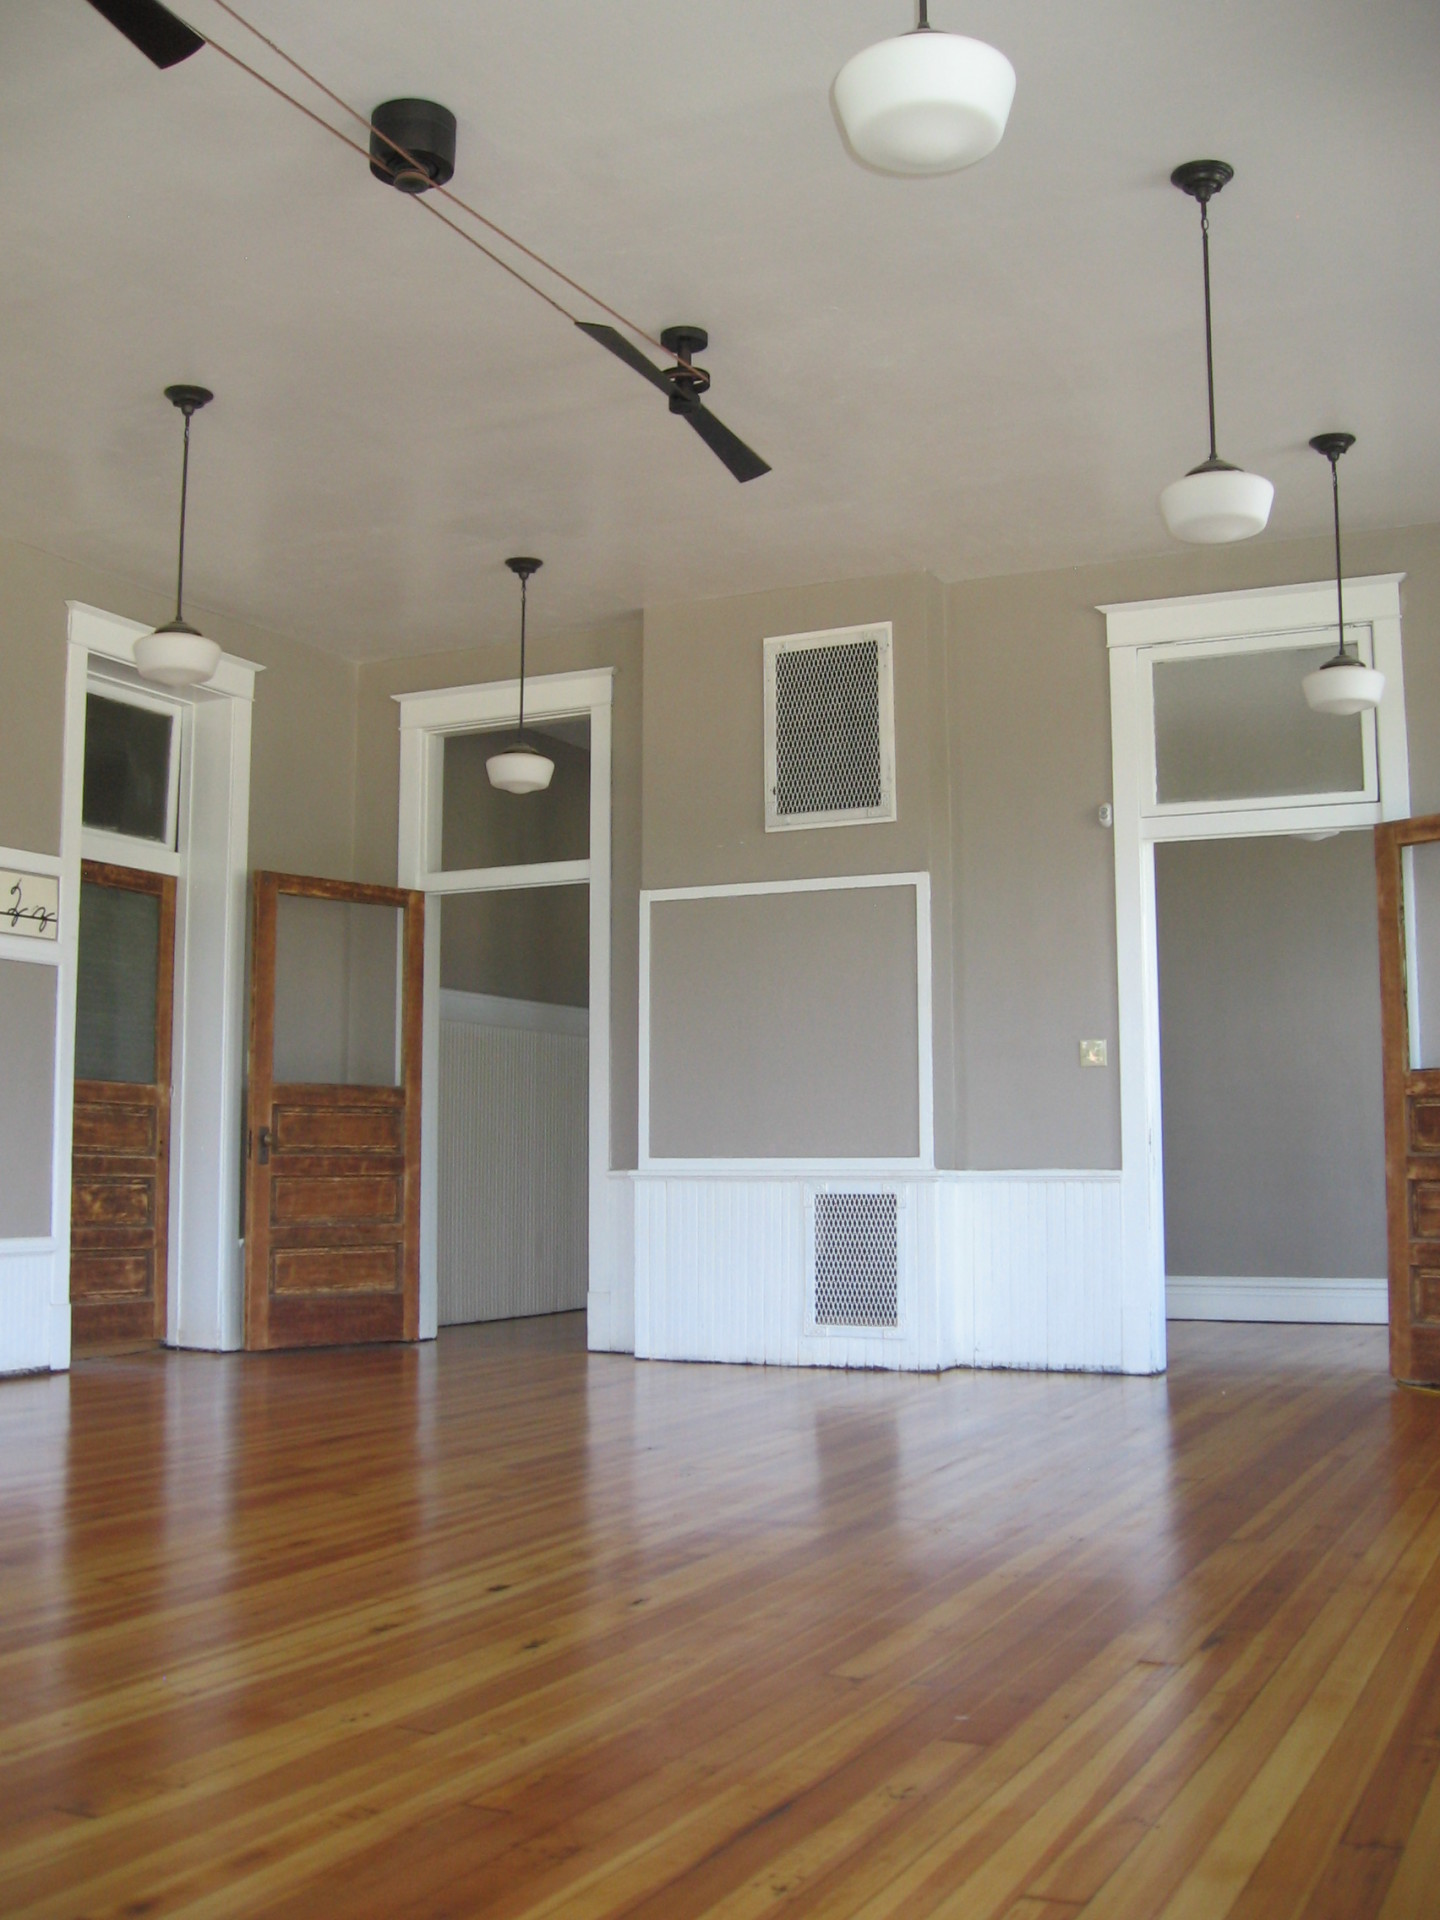 The William Knaus Boardroom